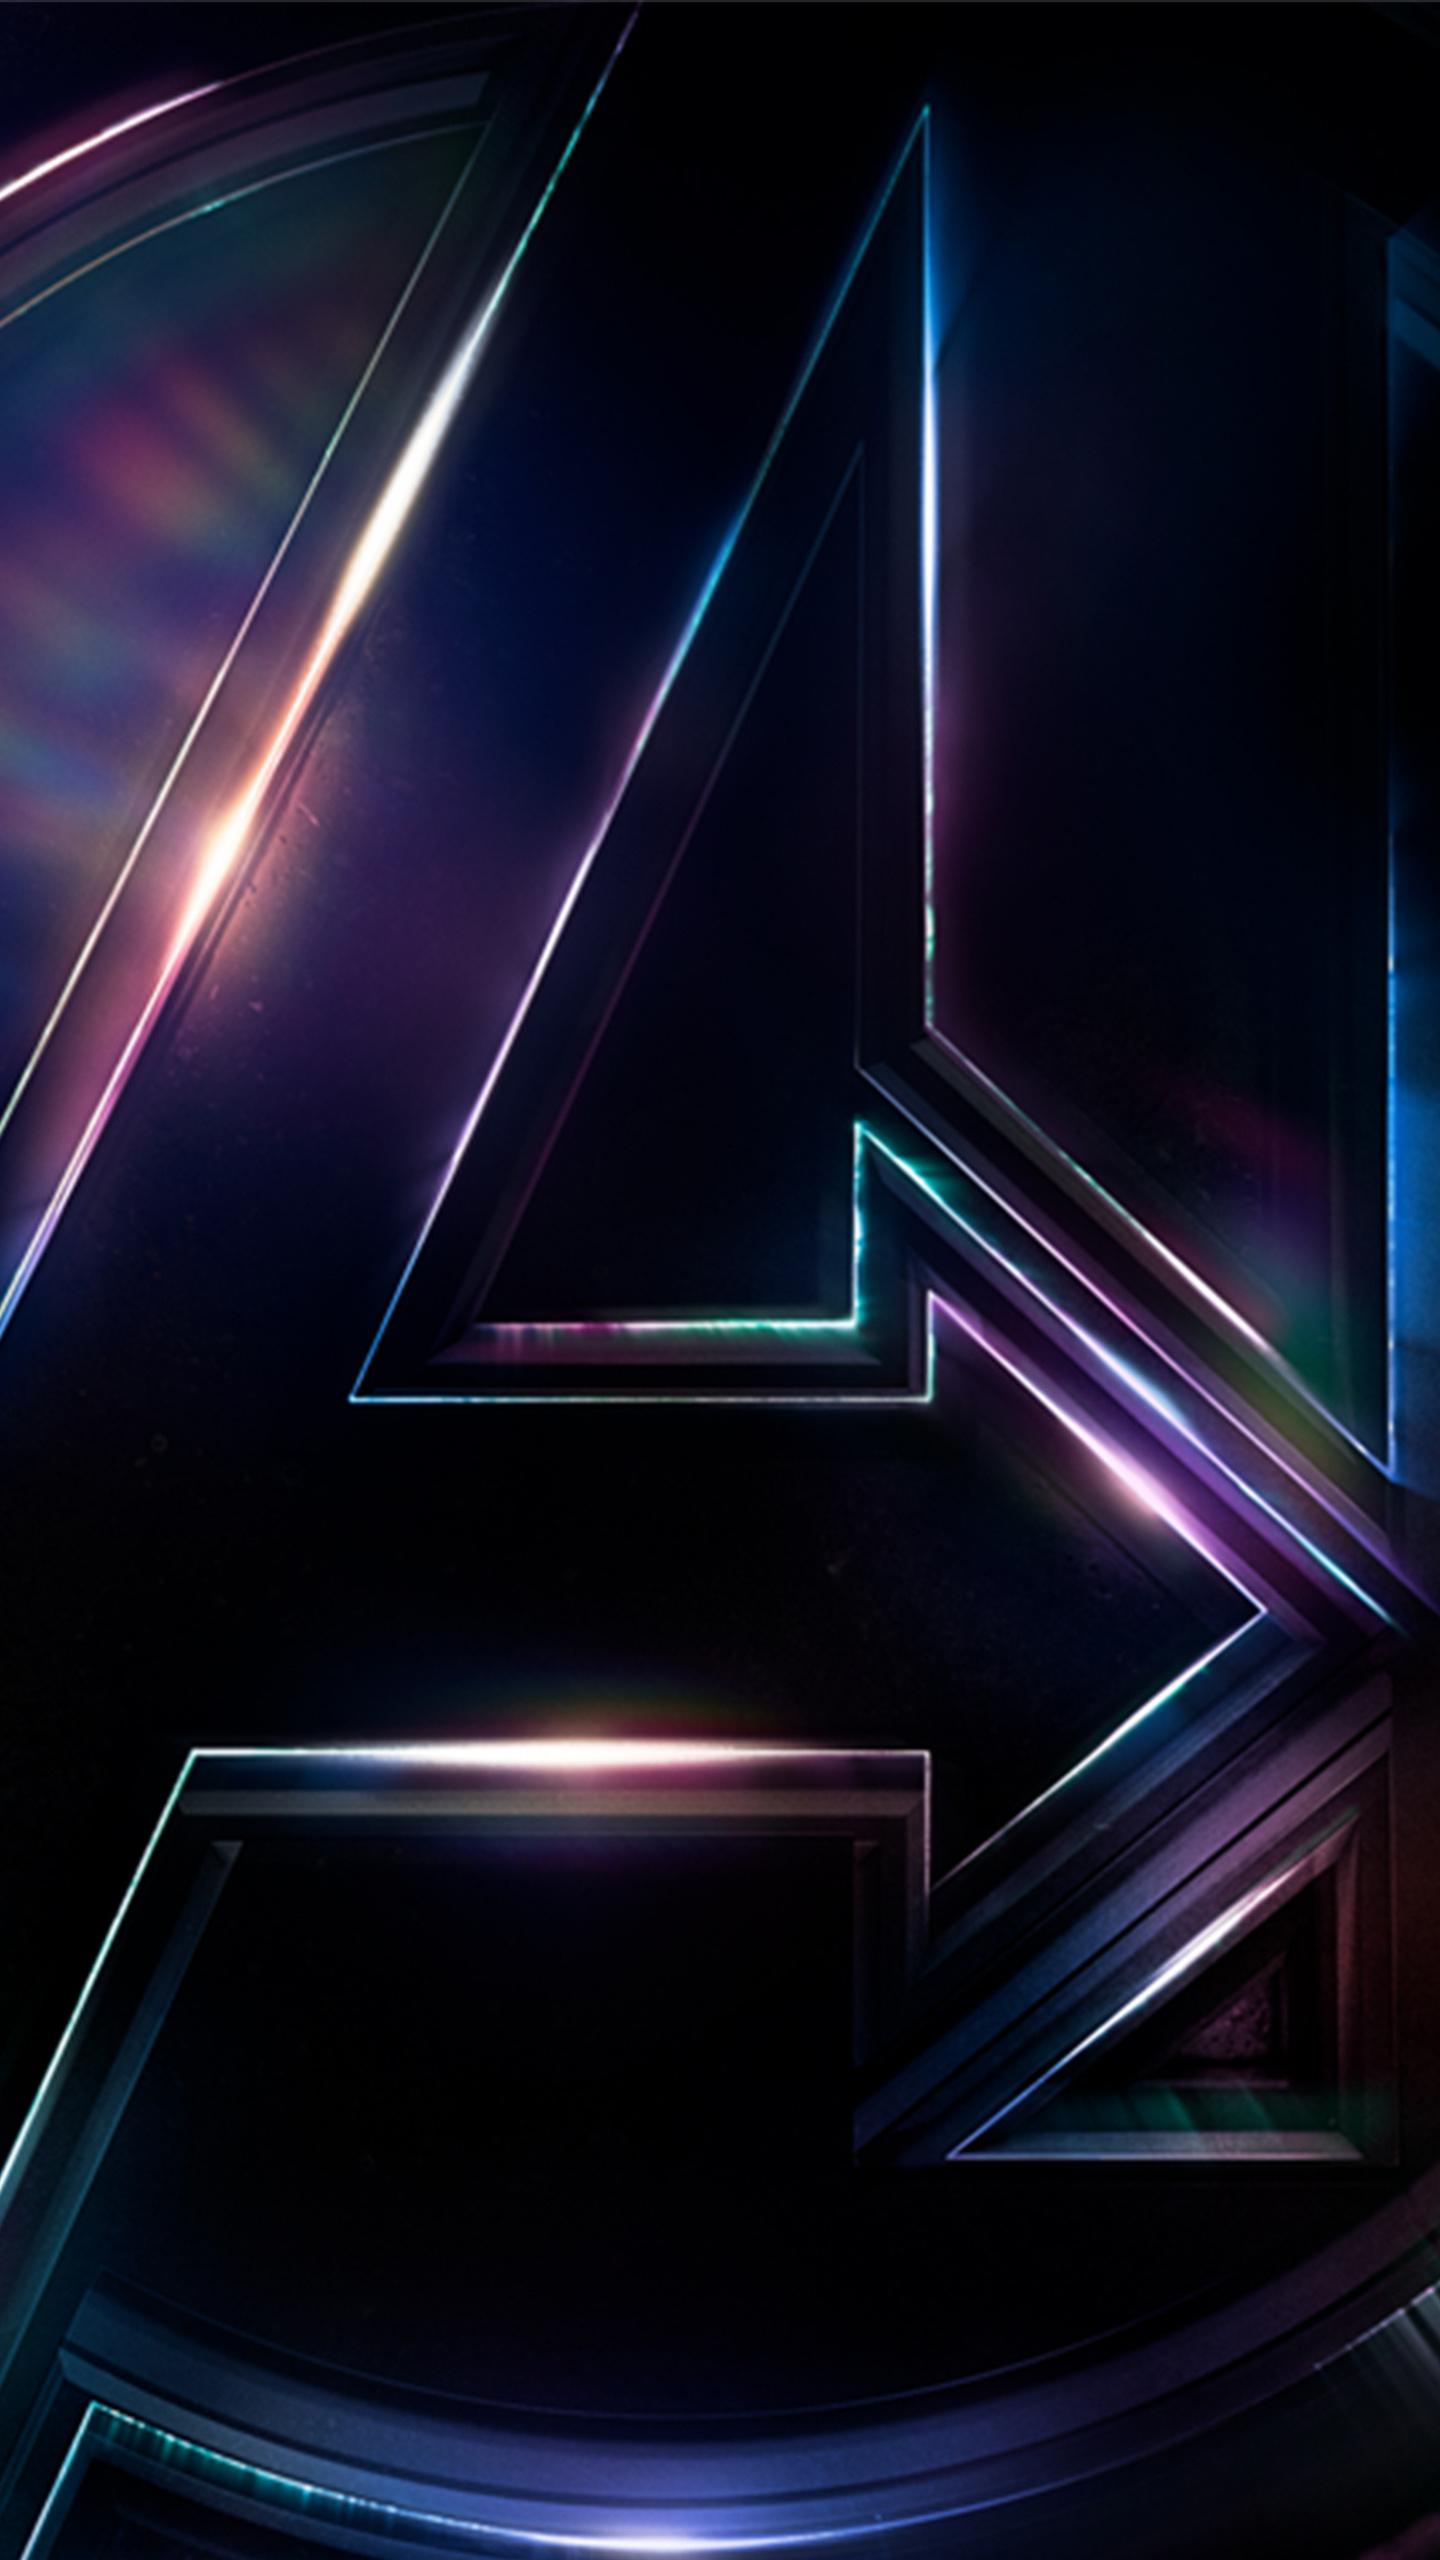 1440x2560 Avengers Infinity War 4k Logo Poster Samsung ...